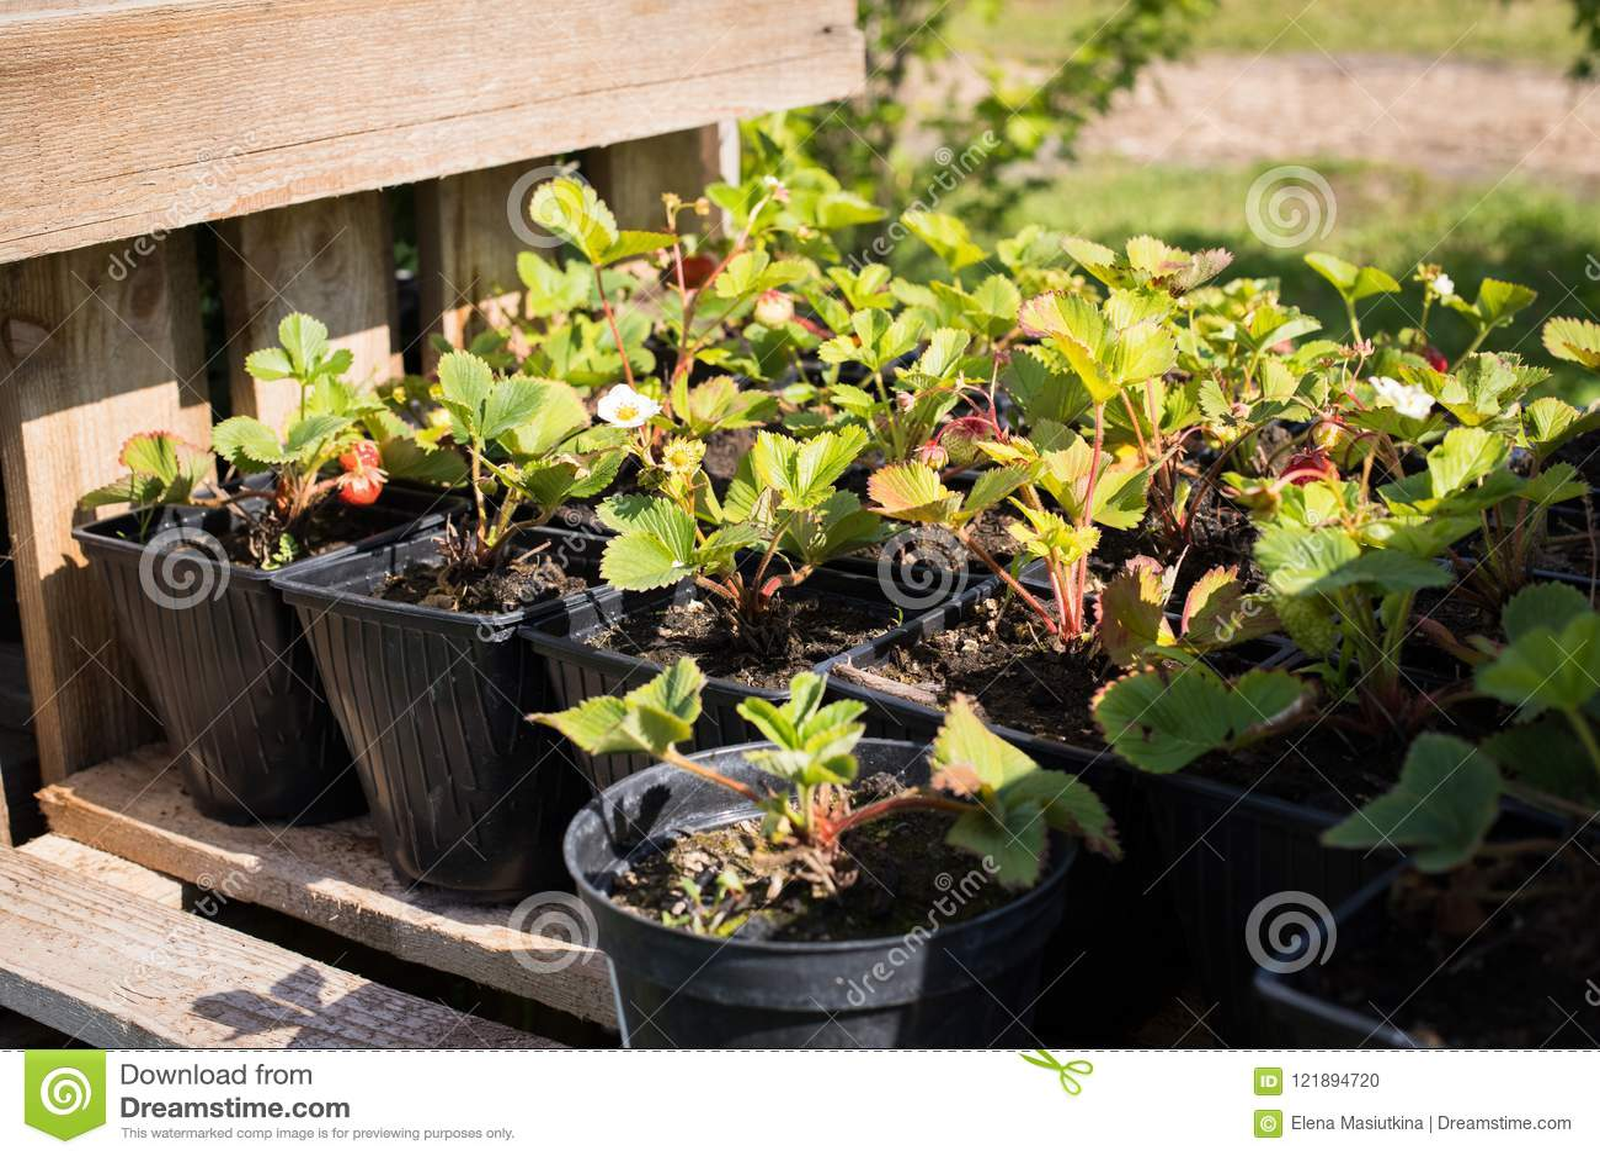 Seedlings Of Strawberries In Pots Growing In Garden Nursery.